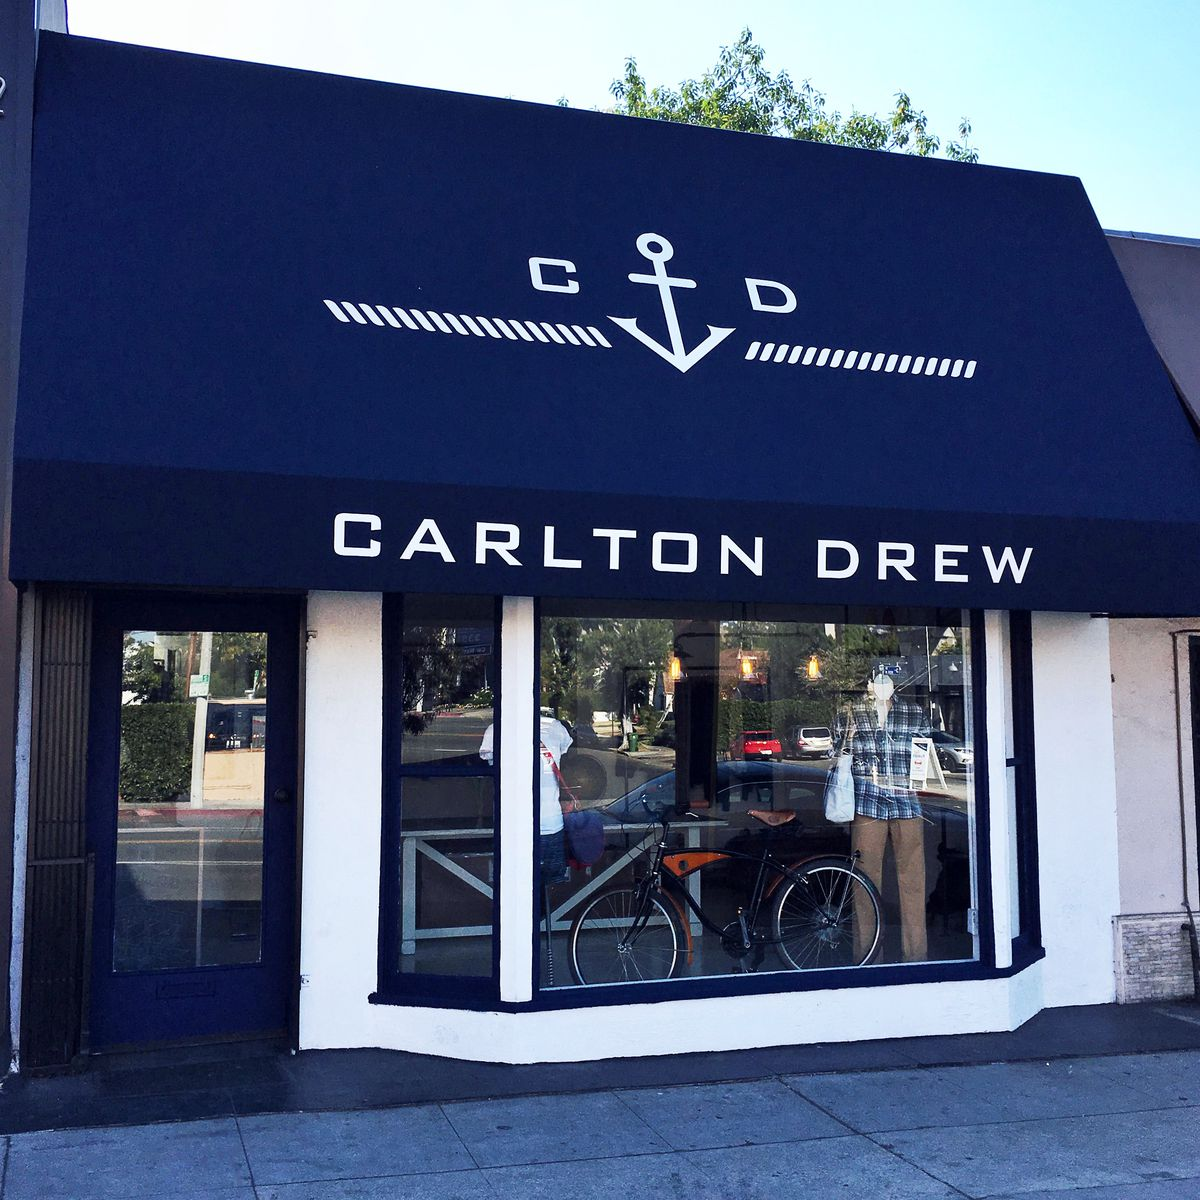 carlton-drew-west-third-street-01_2016_01.JPG